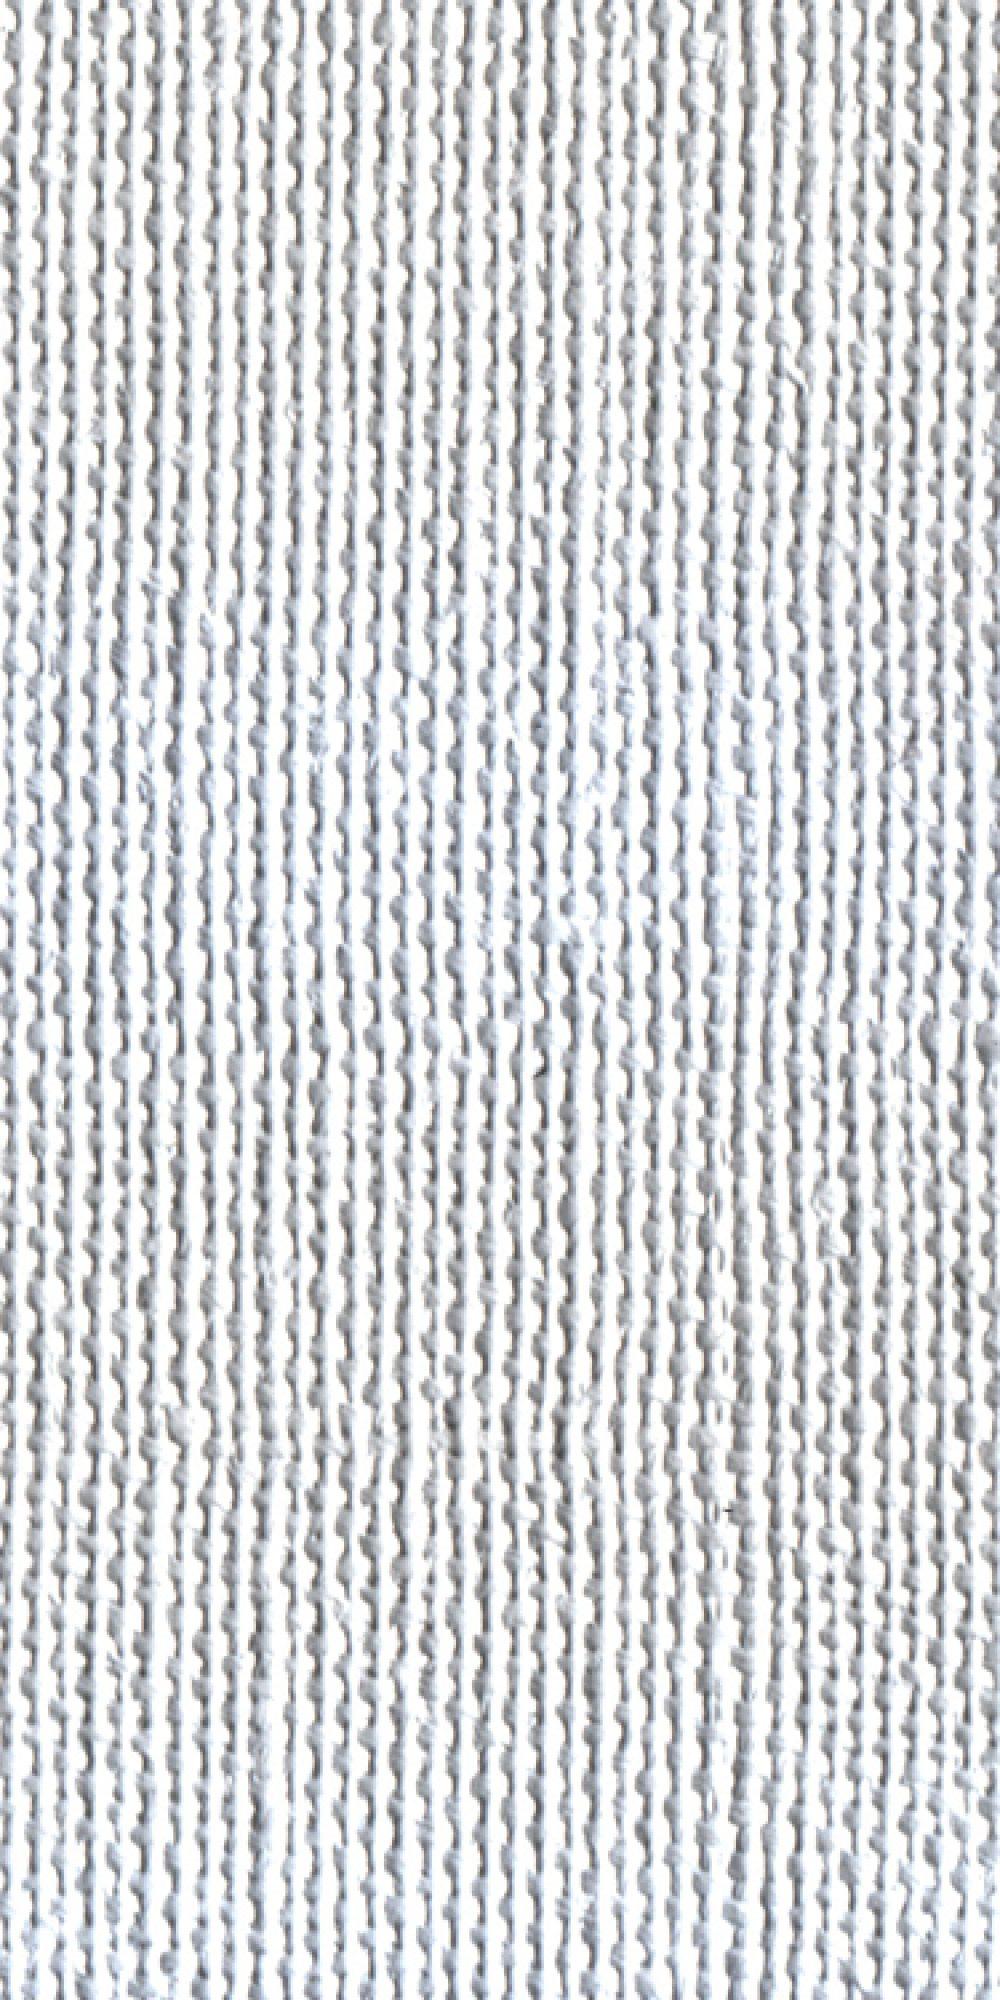 Vario Cromatica Juta Acrylic sheets, Common area, Material